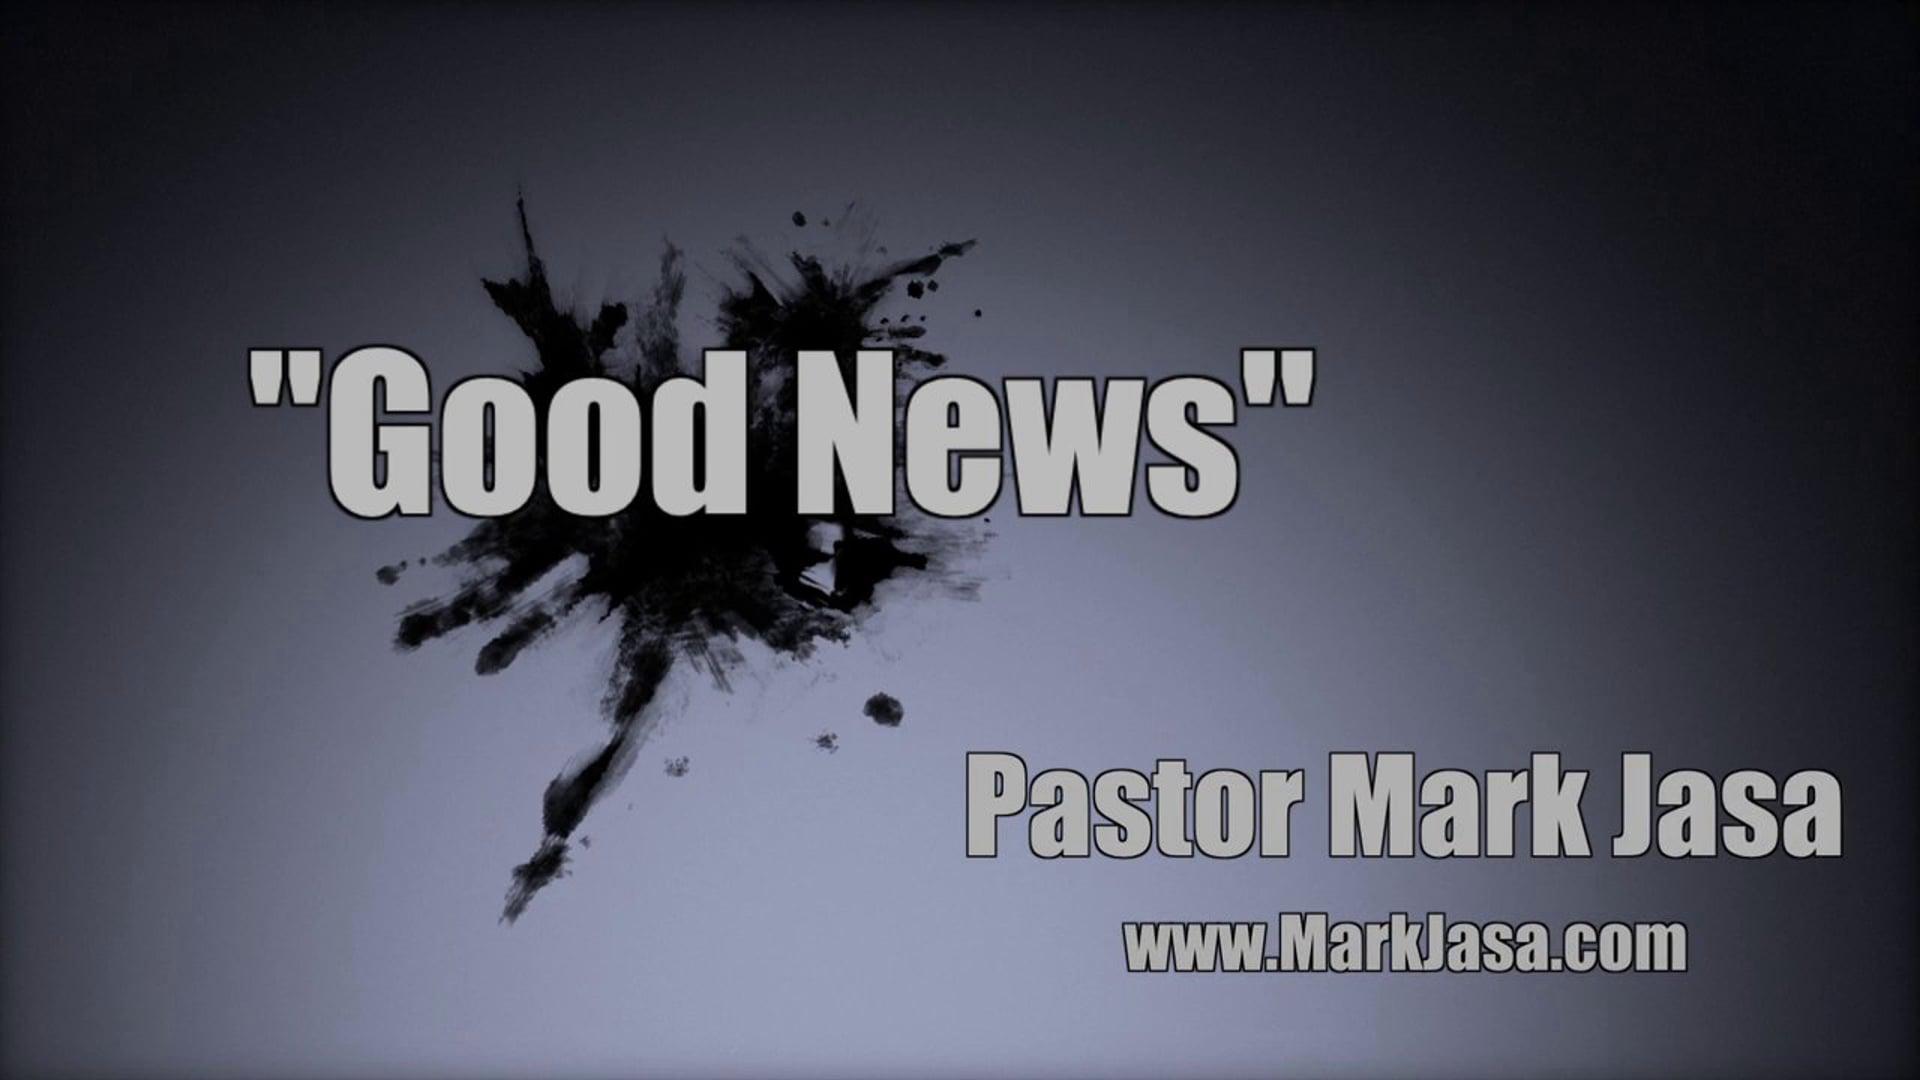 """Good News"" by Pastor Mark Jasa"